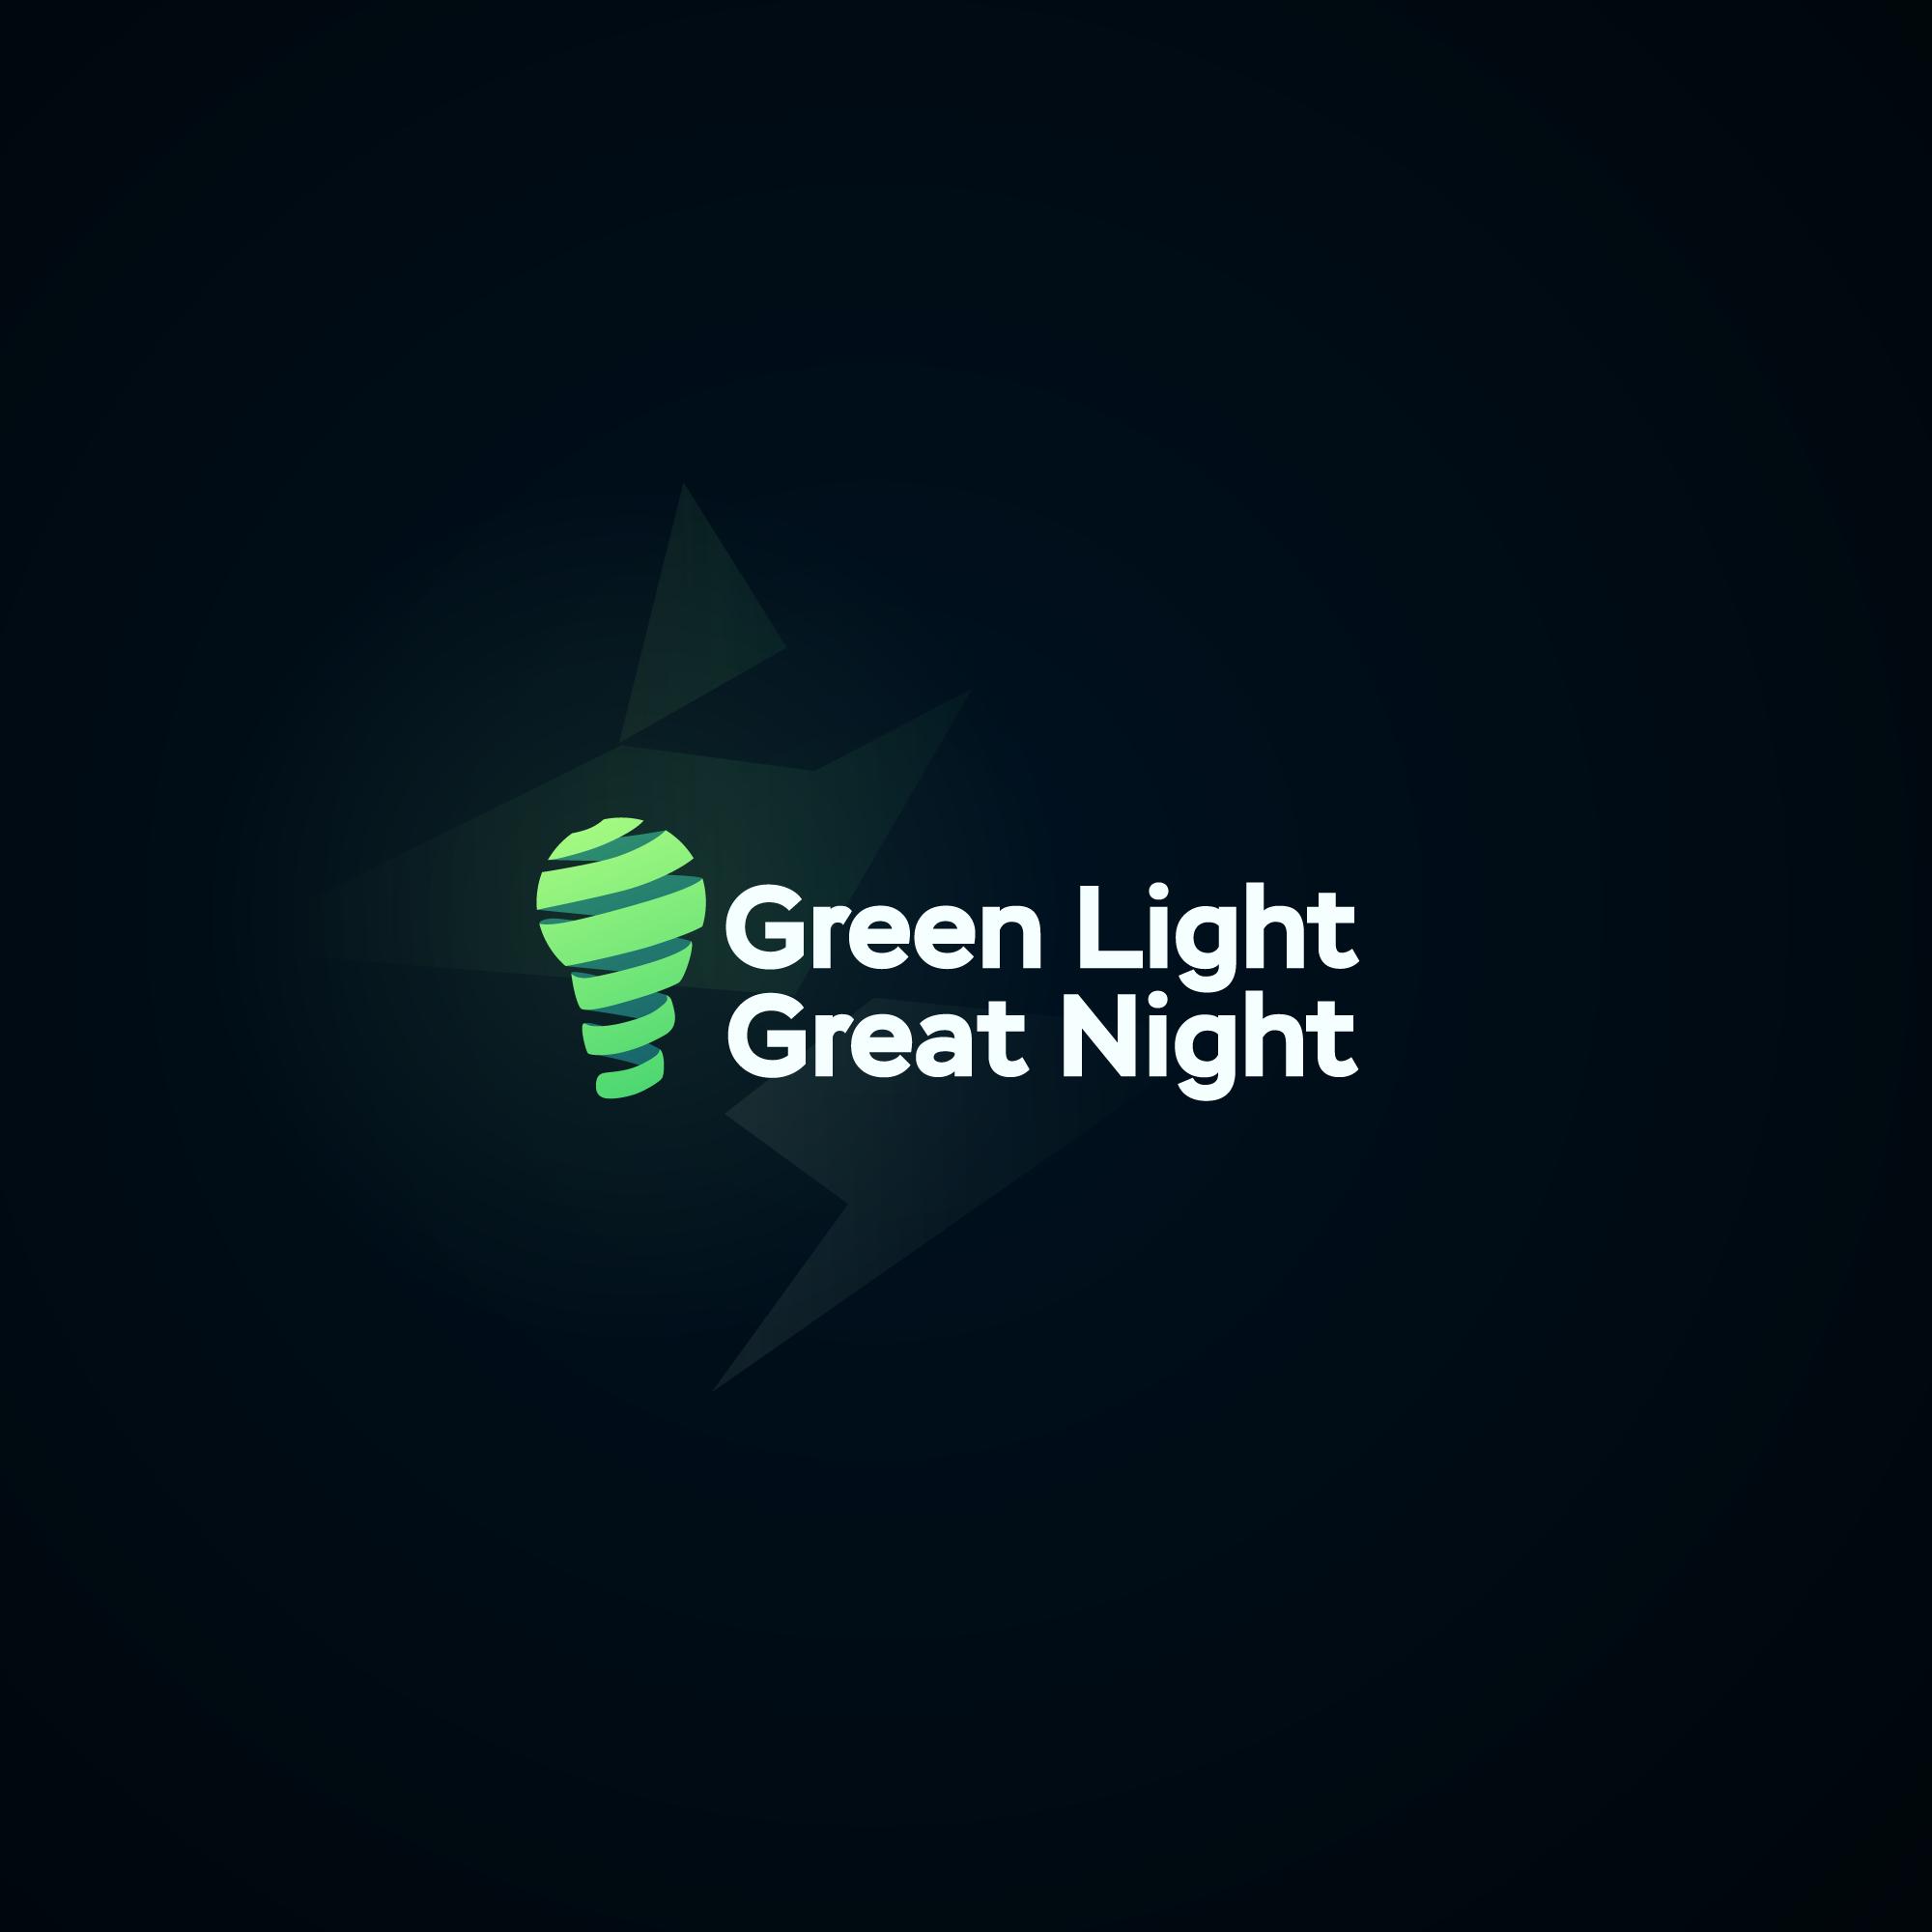 Green Light promotion